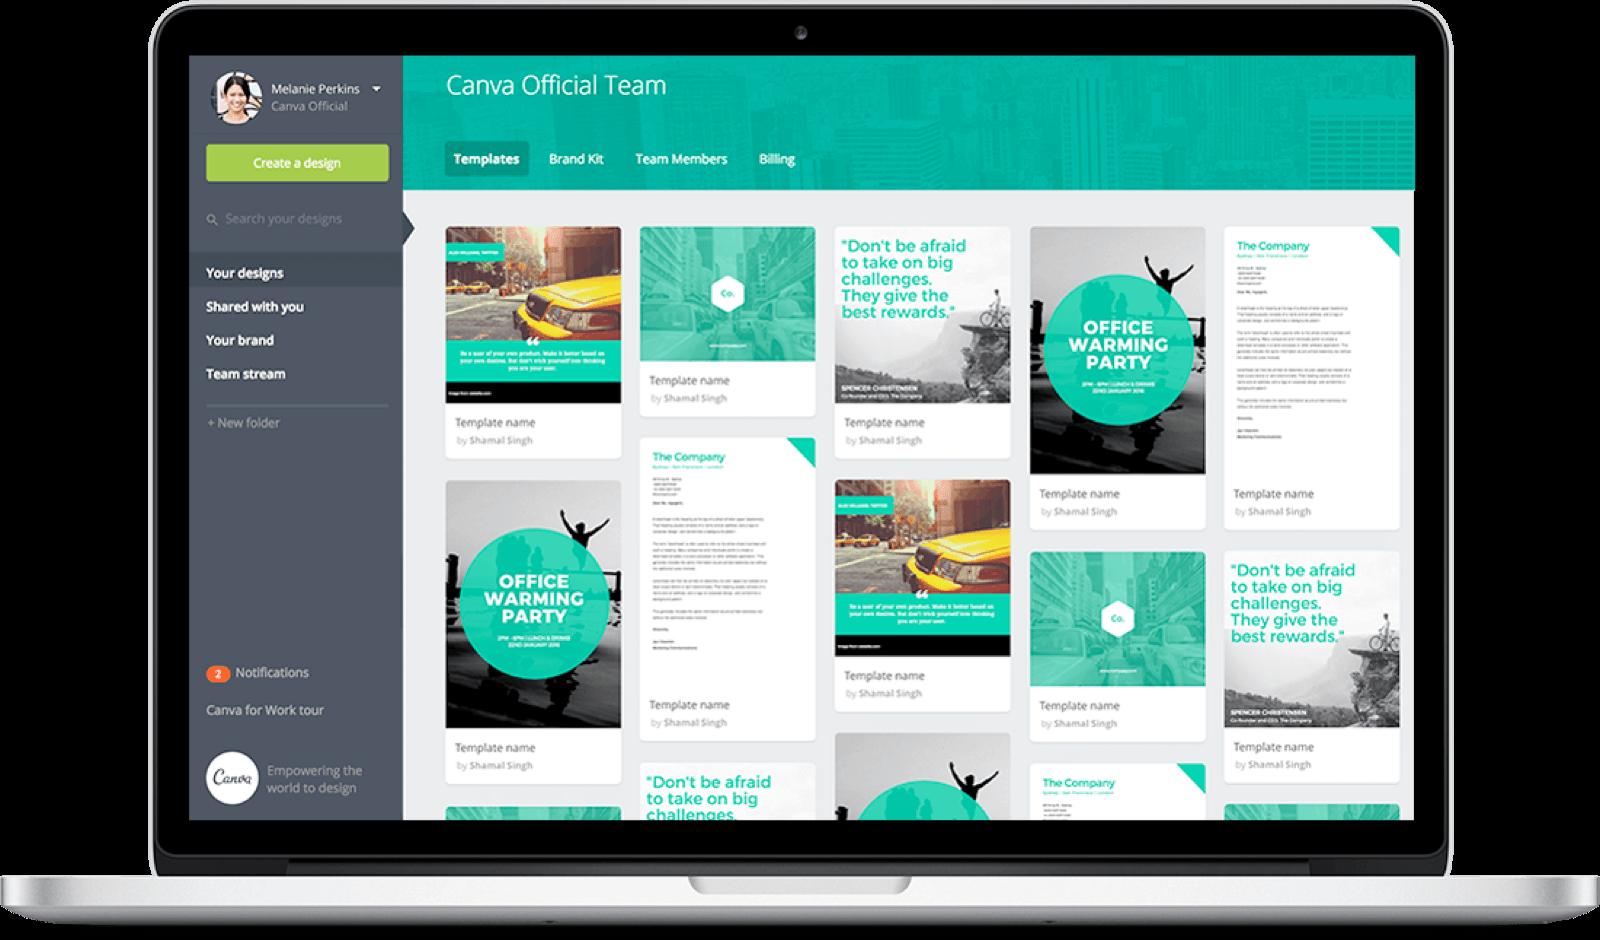 canva-app-business-productivity-tips-advice-smartphone-entrepreneur-teamwork-scheduling